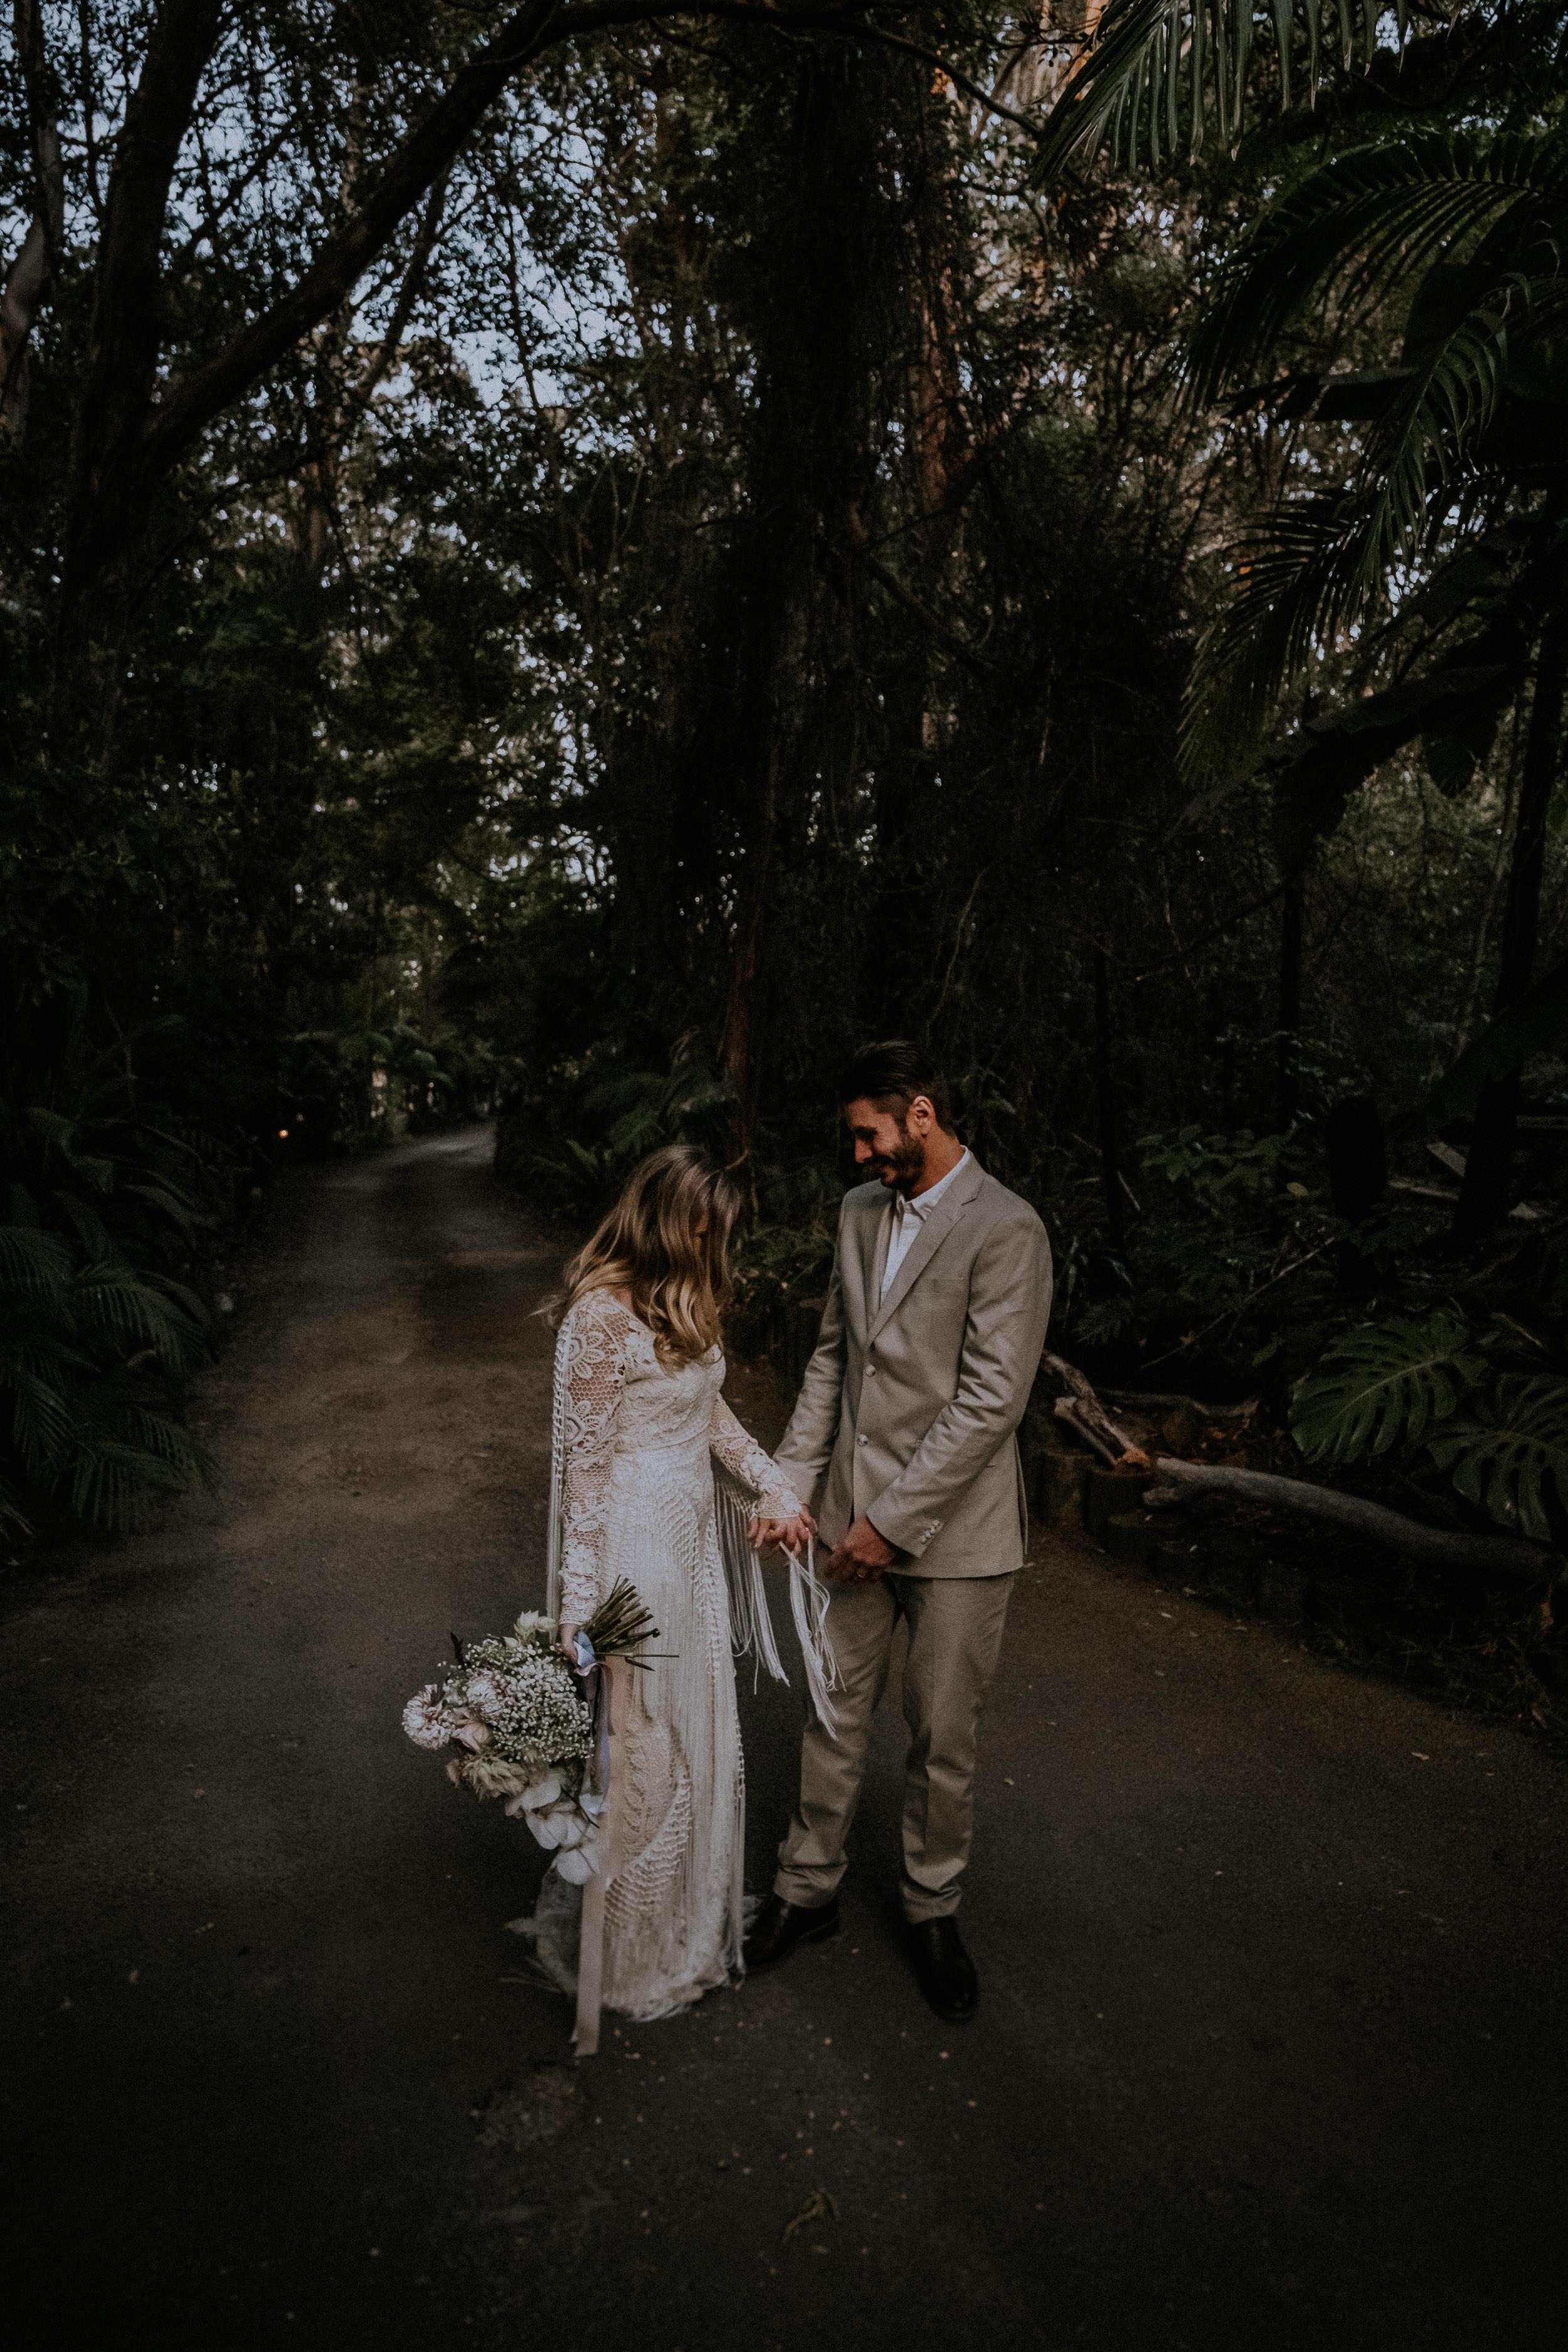 S&A Elopement - Kings & Thieves - Shred 'Til Dead - Central Coast Beach Forest Wedding - 312.jpg